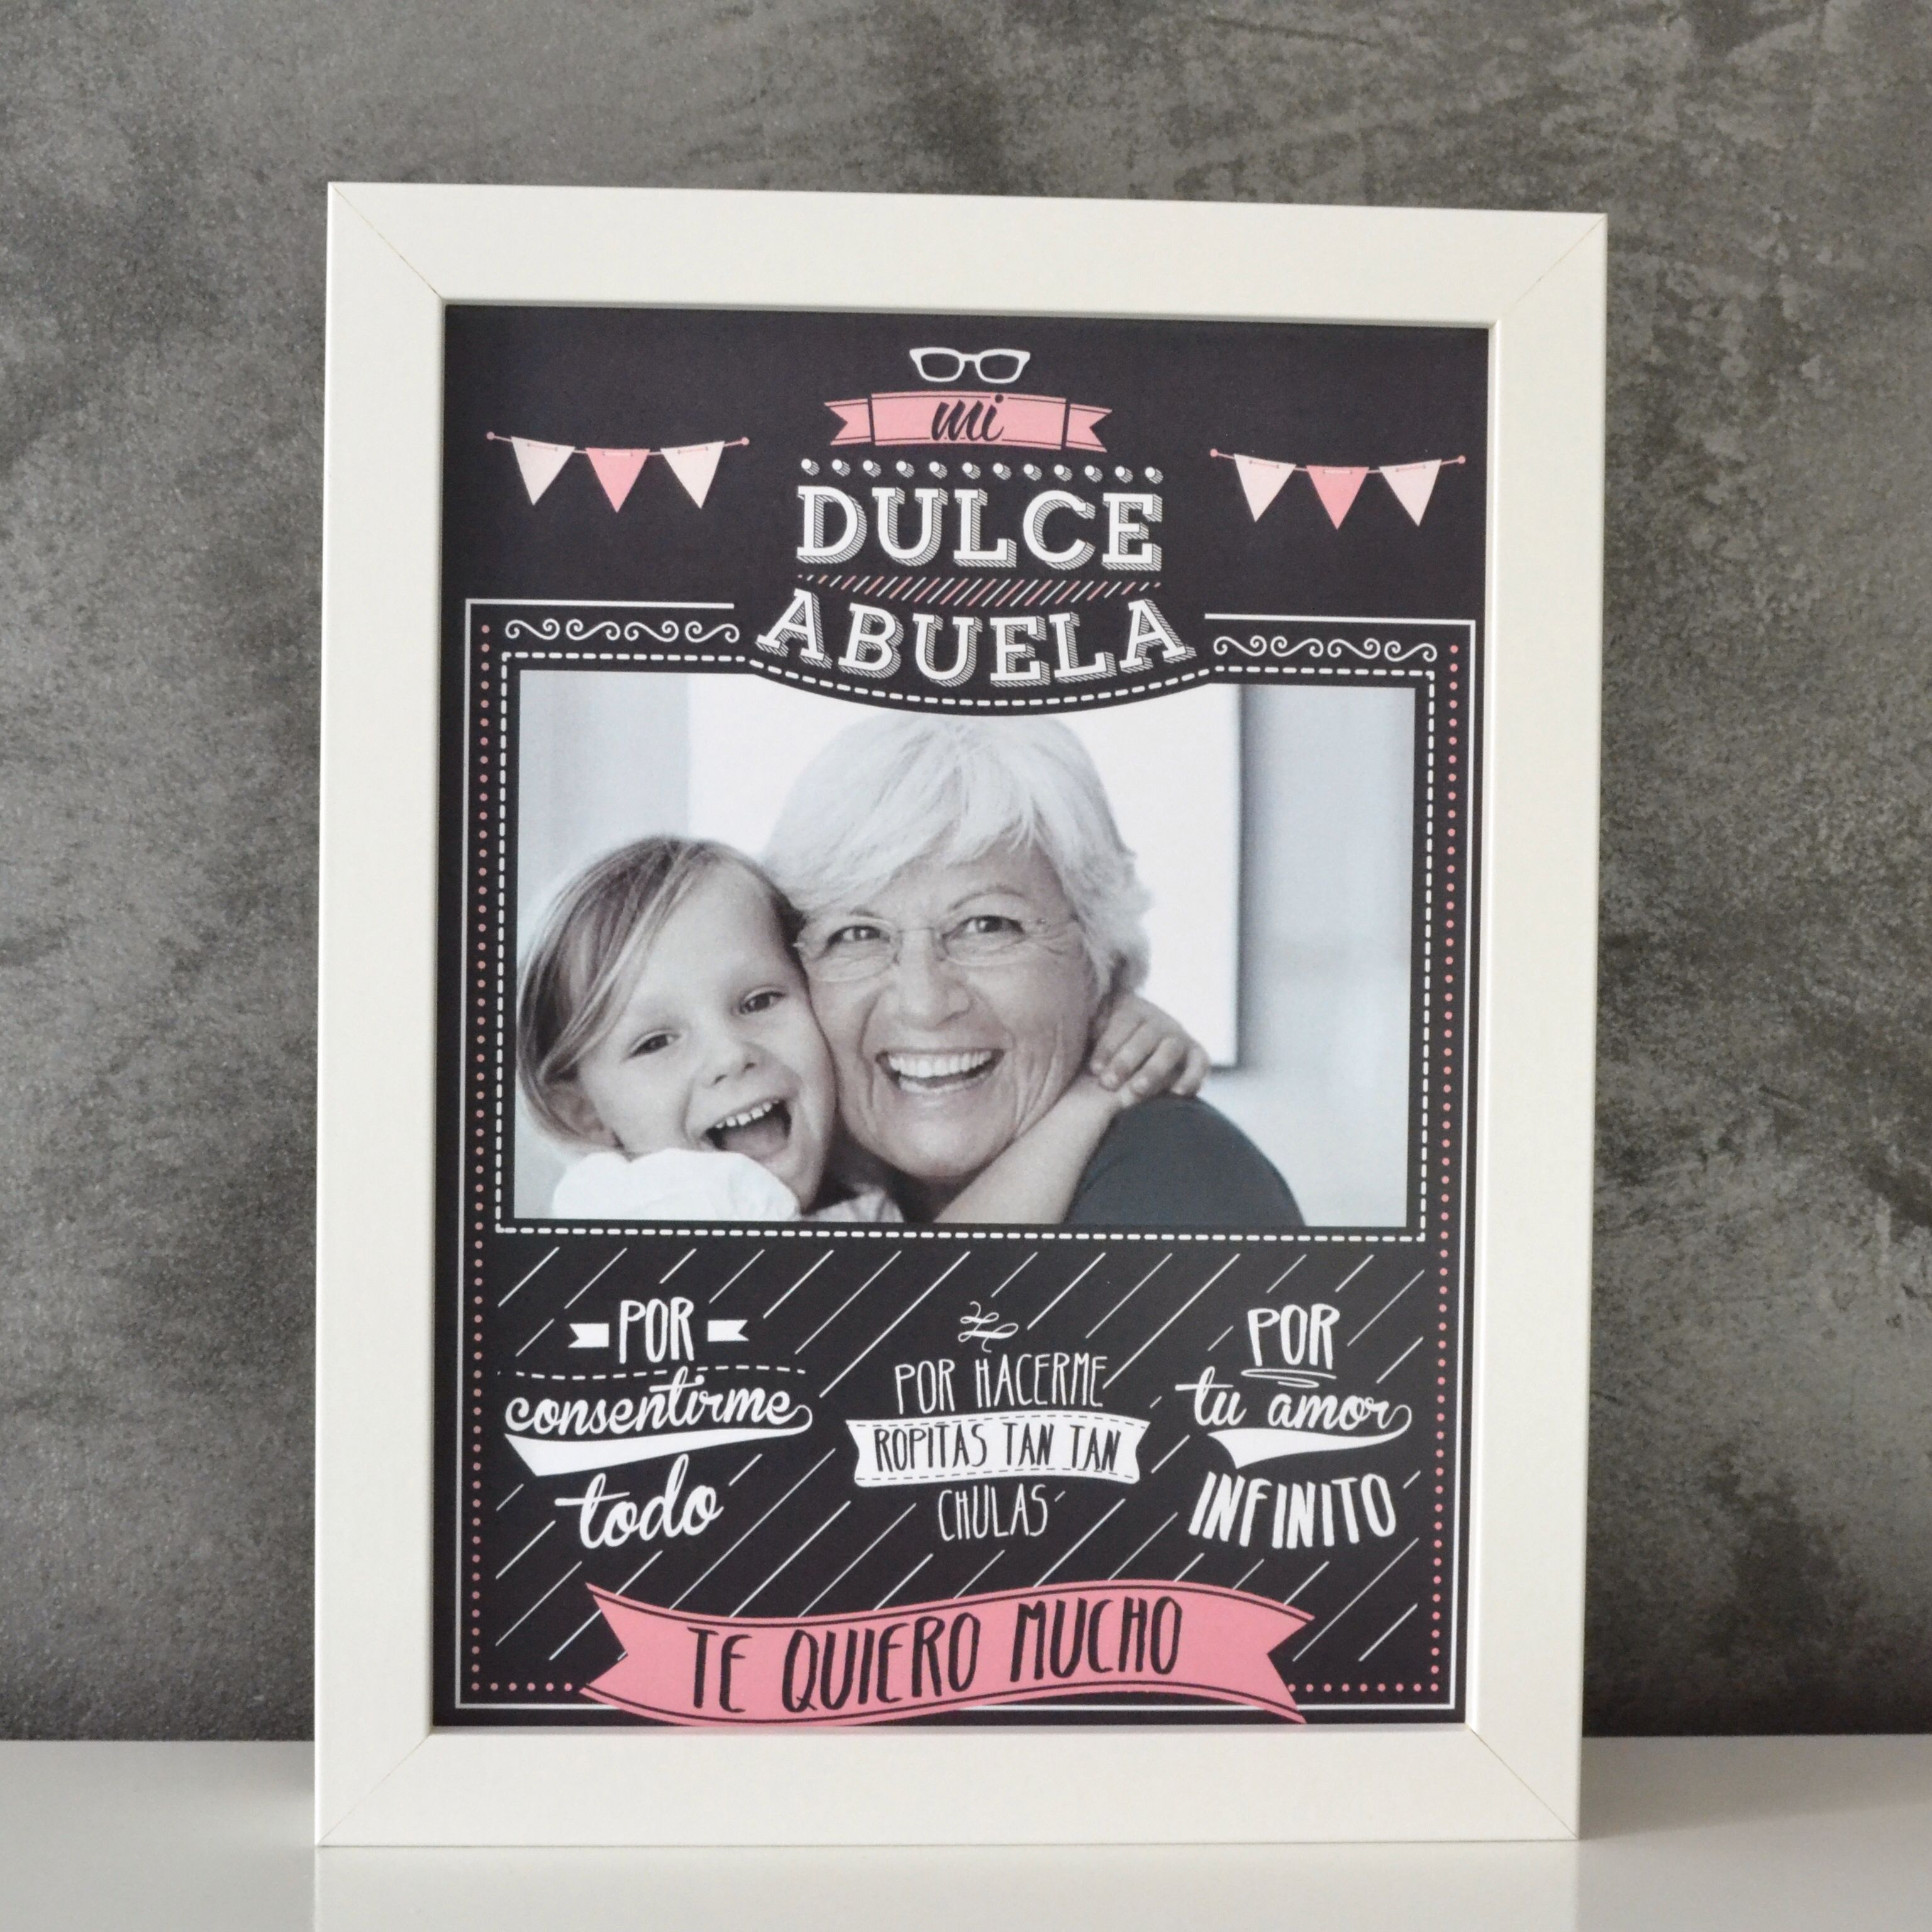 Original cuadro para decirle a tu dulce abuela lo mucho for Regalos abuela ideas